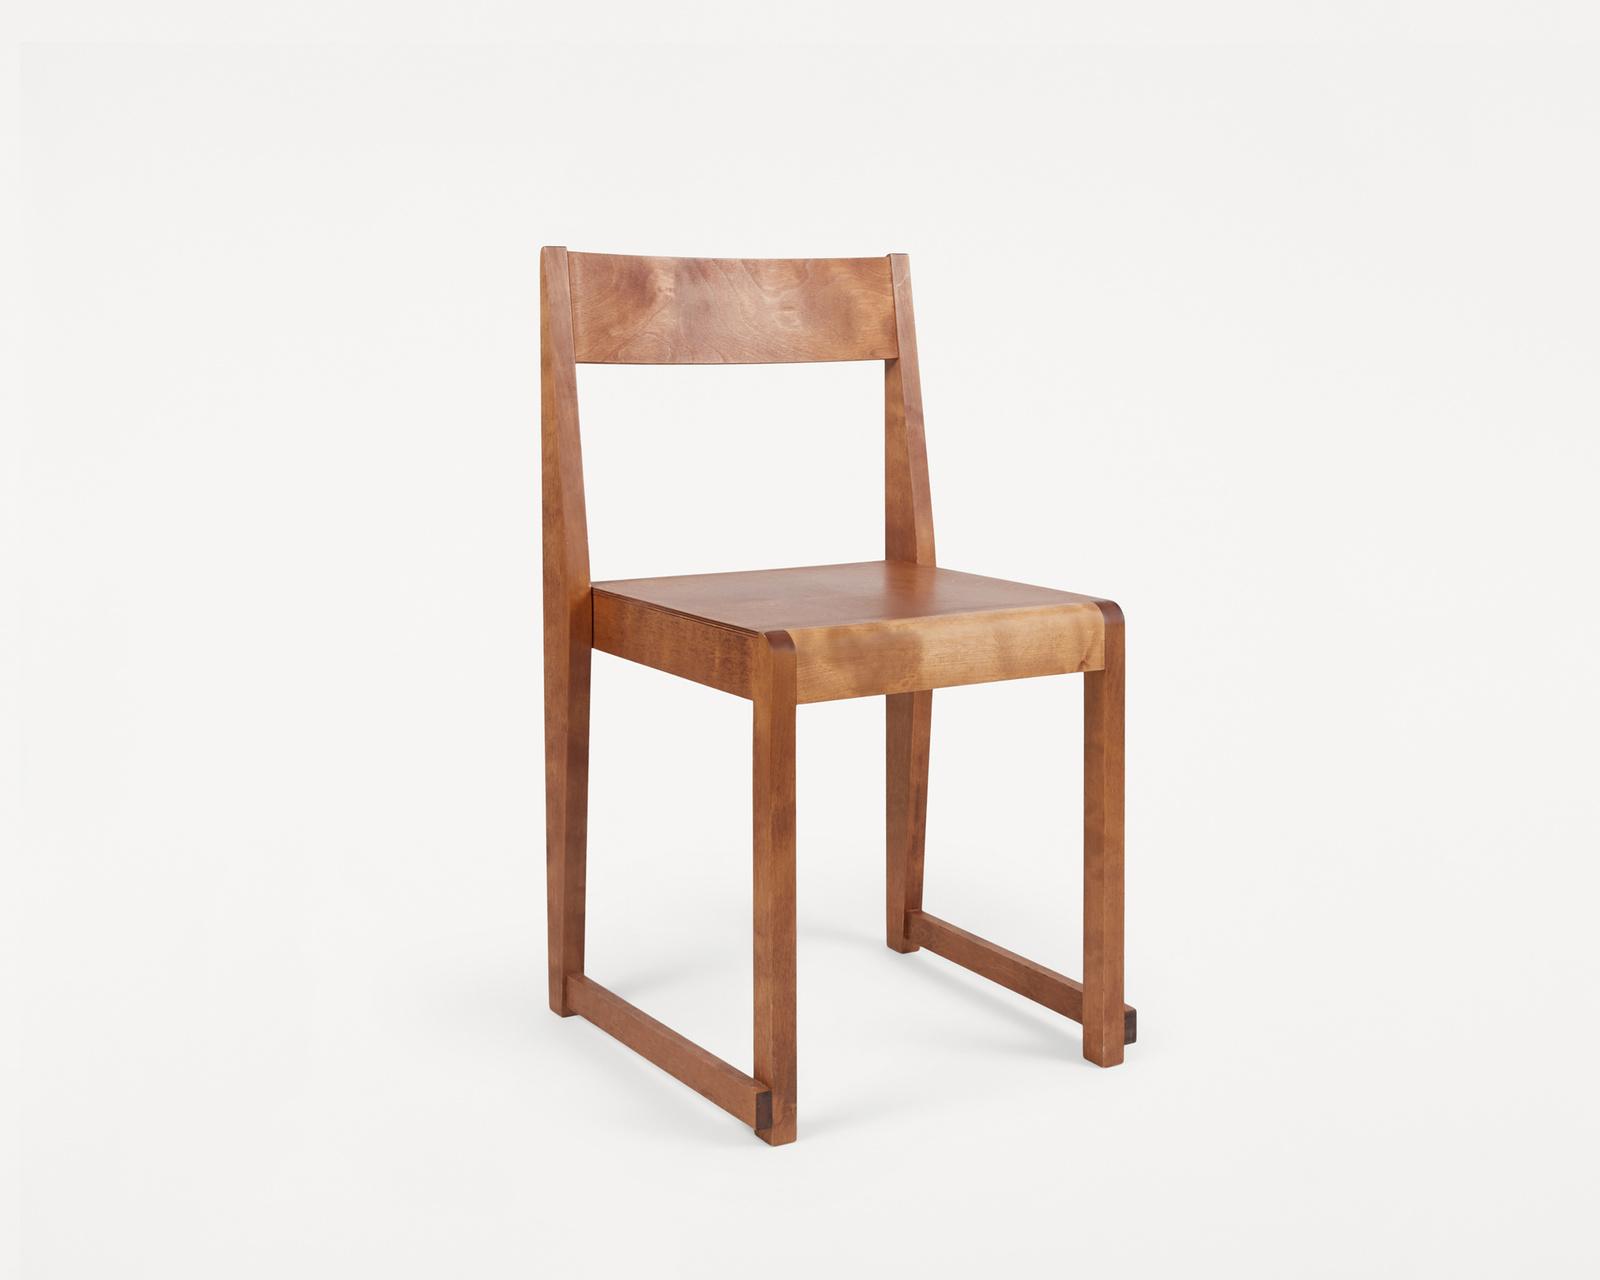 Frama Chair 01 Warm Brown Wood